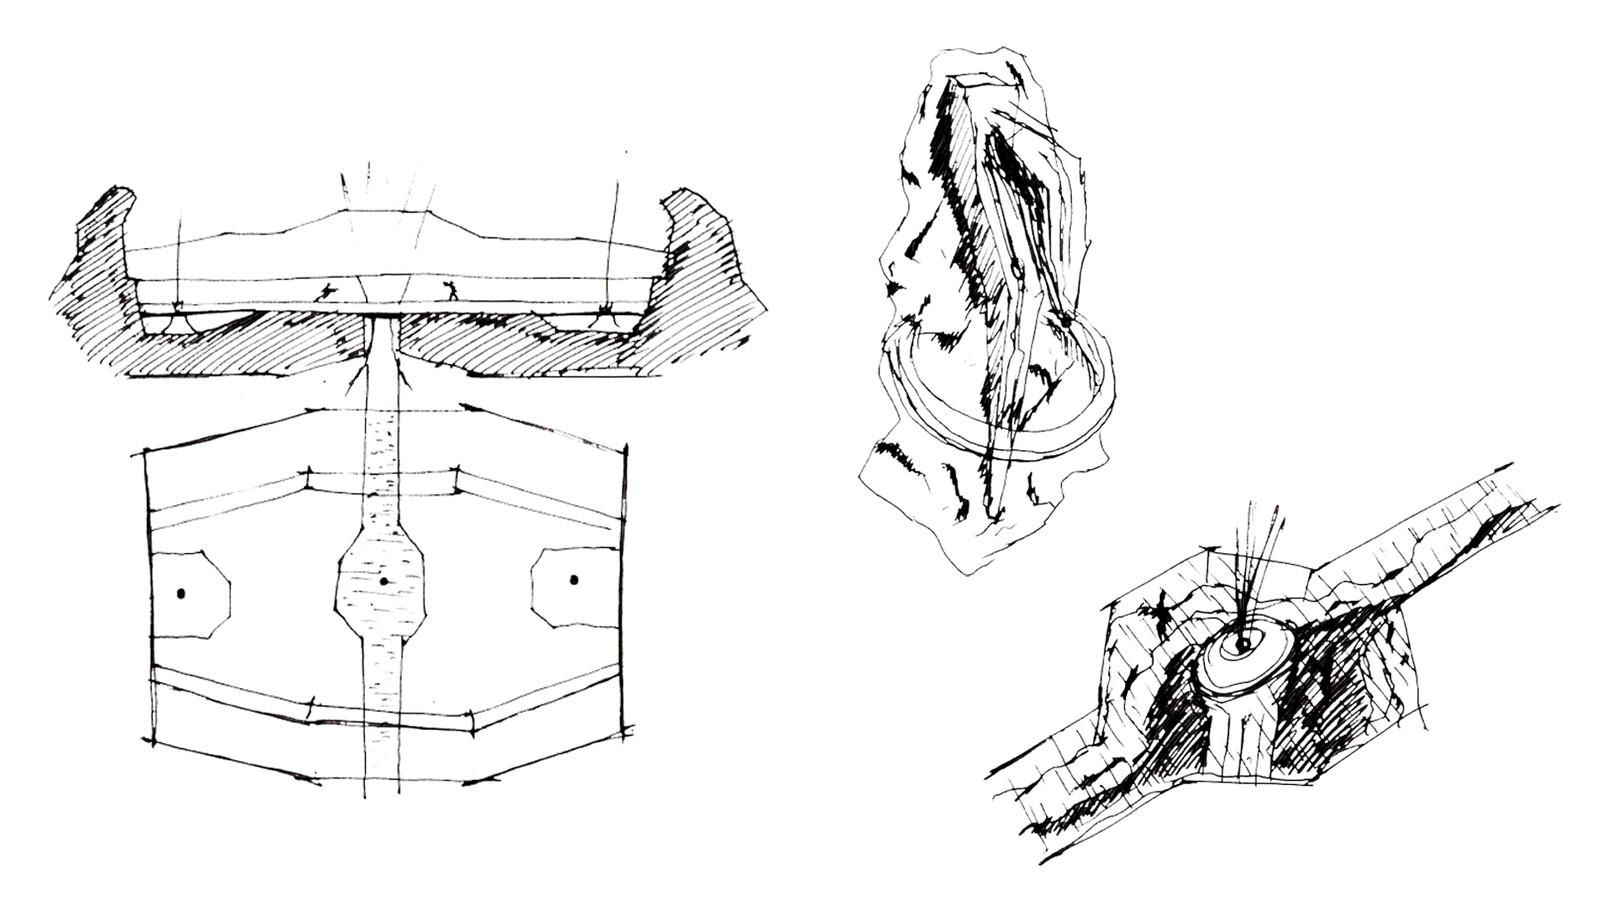 Original conceptual sketches